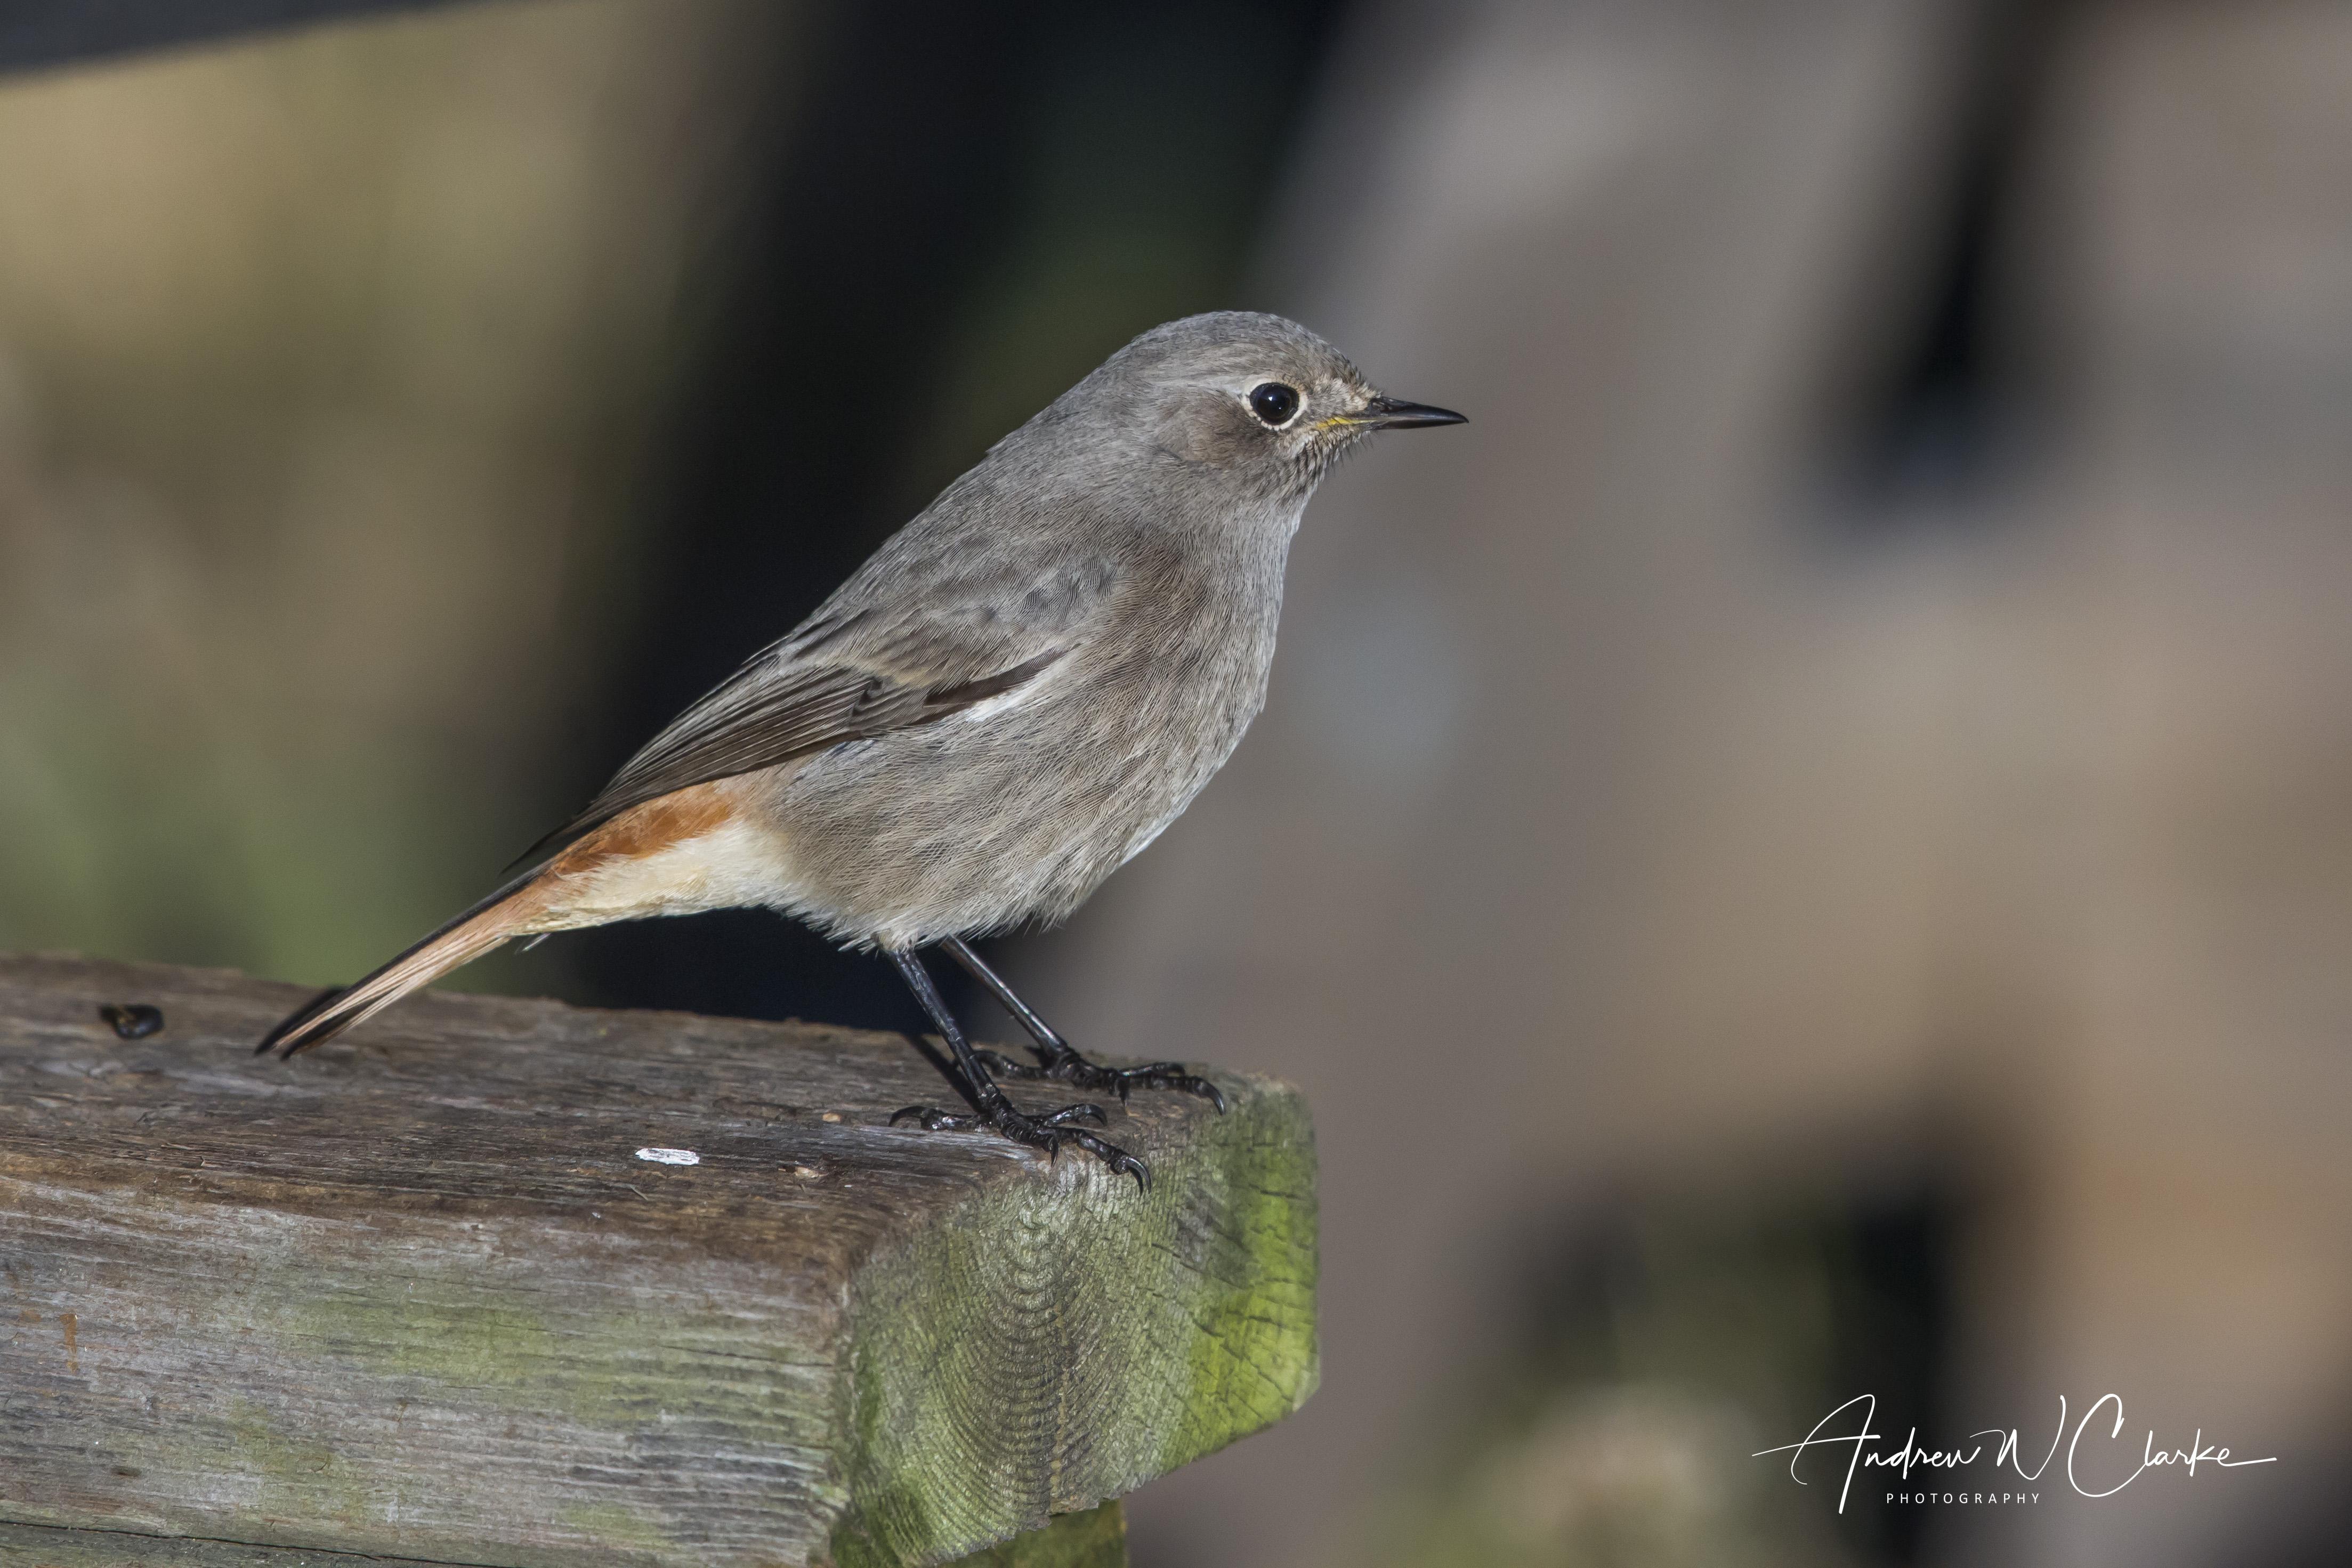 Black Redstart / Svartrødstjert